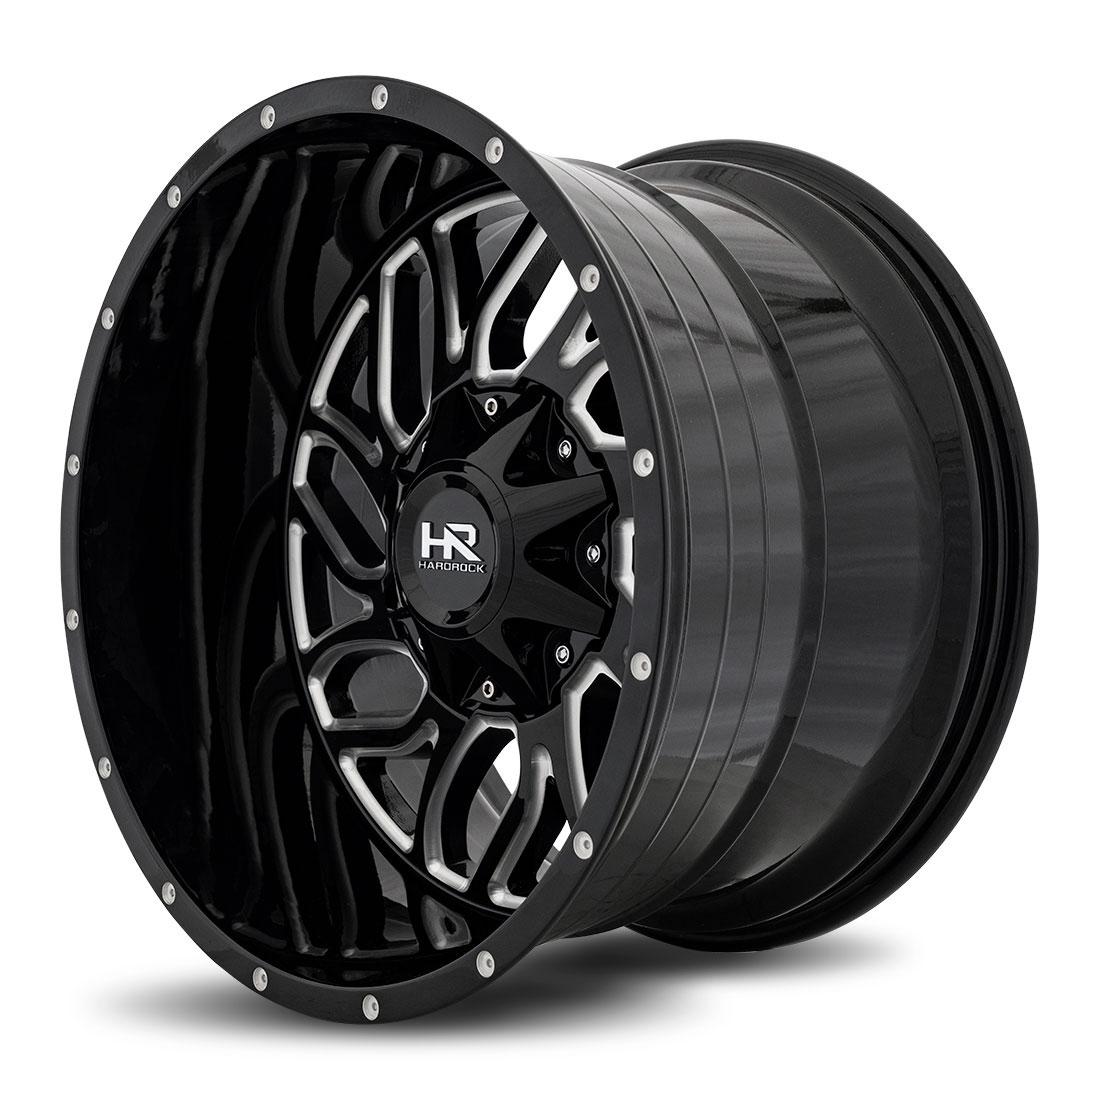 Hardrock Offroad Wheels H707 Destroyer - Gloss Black Milled - 20x12